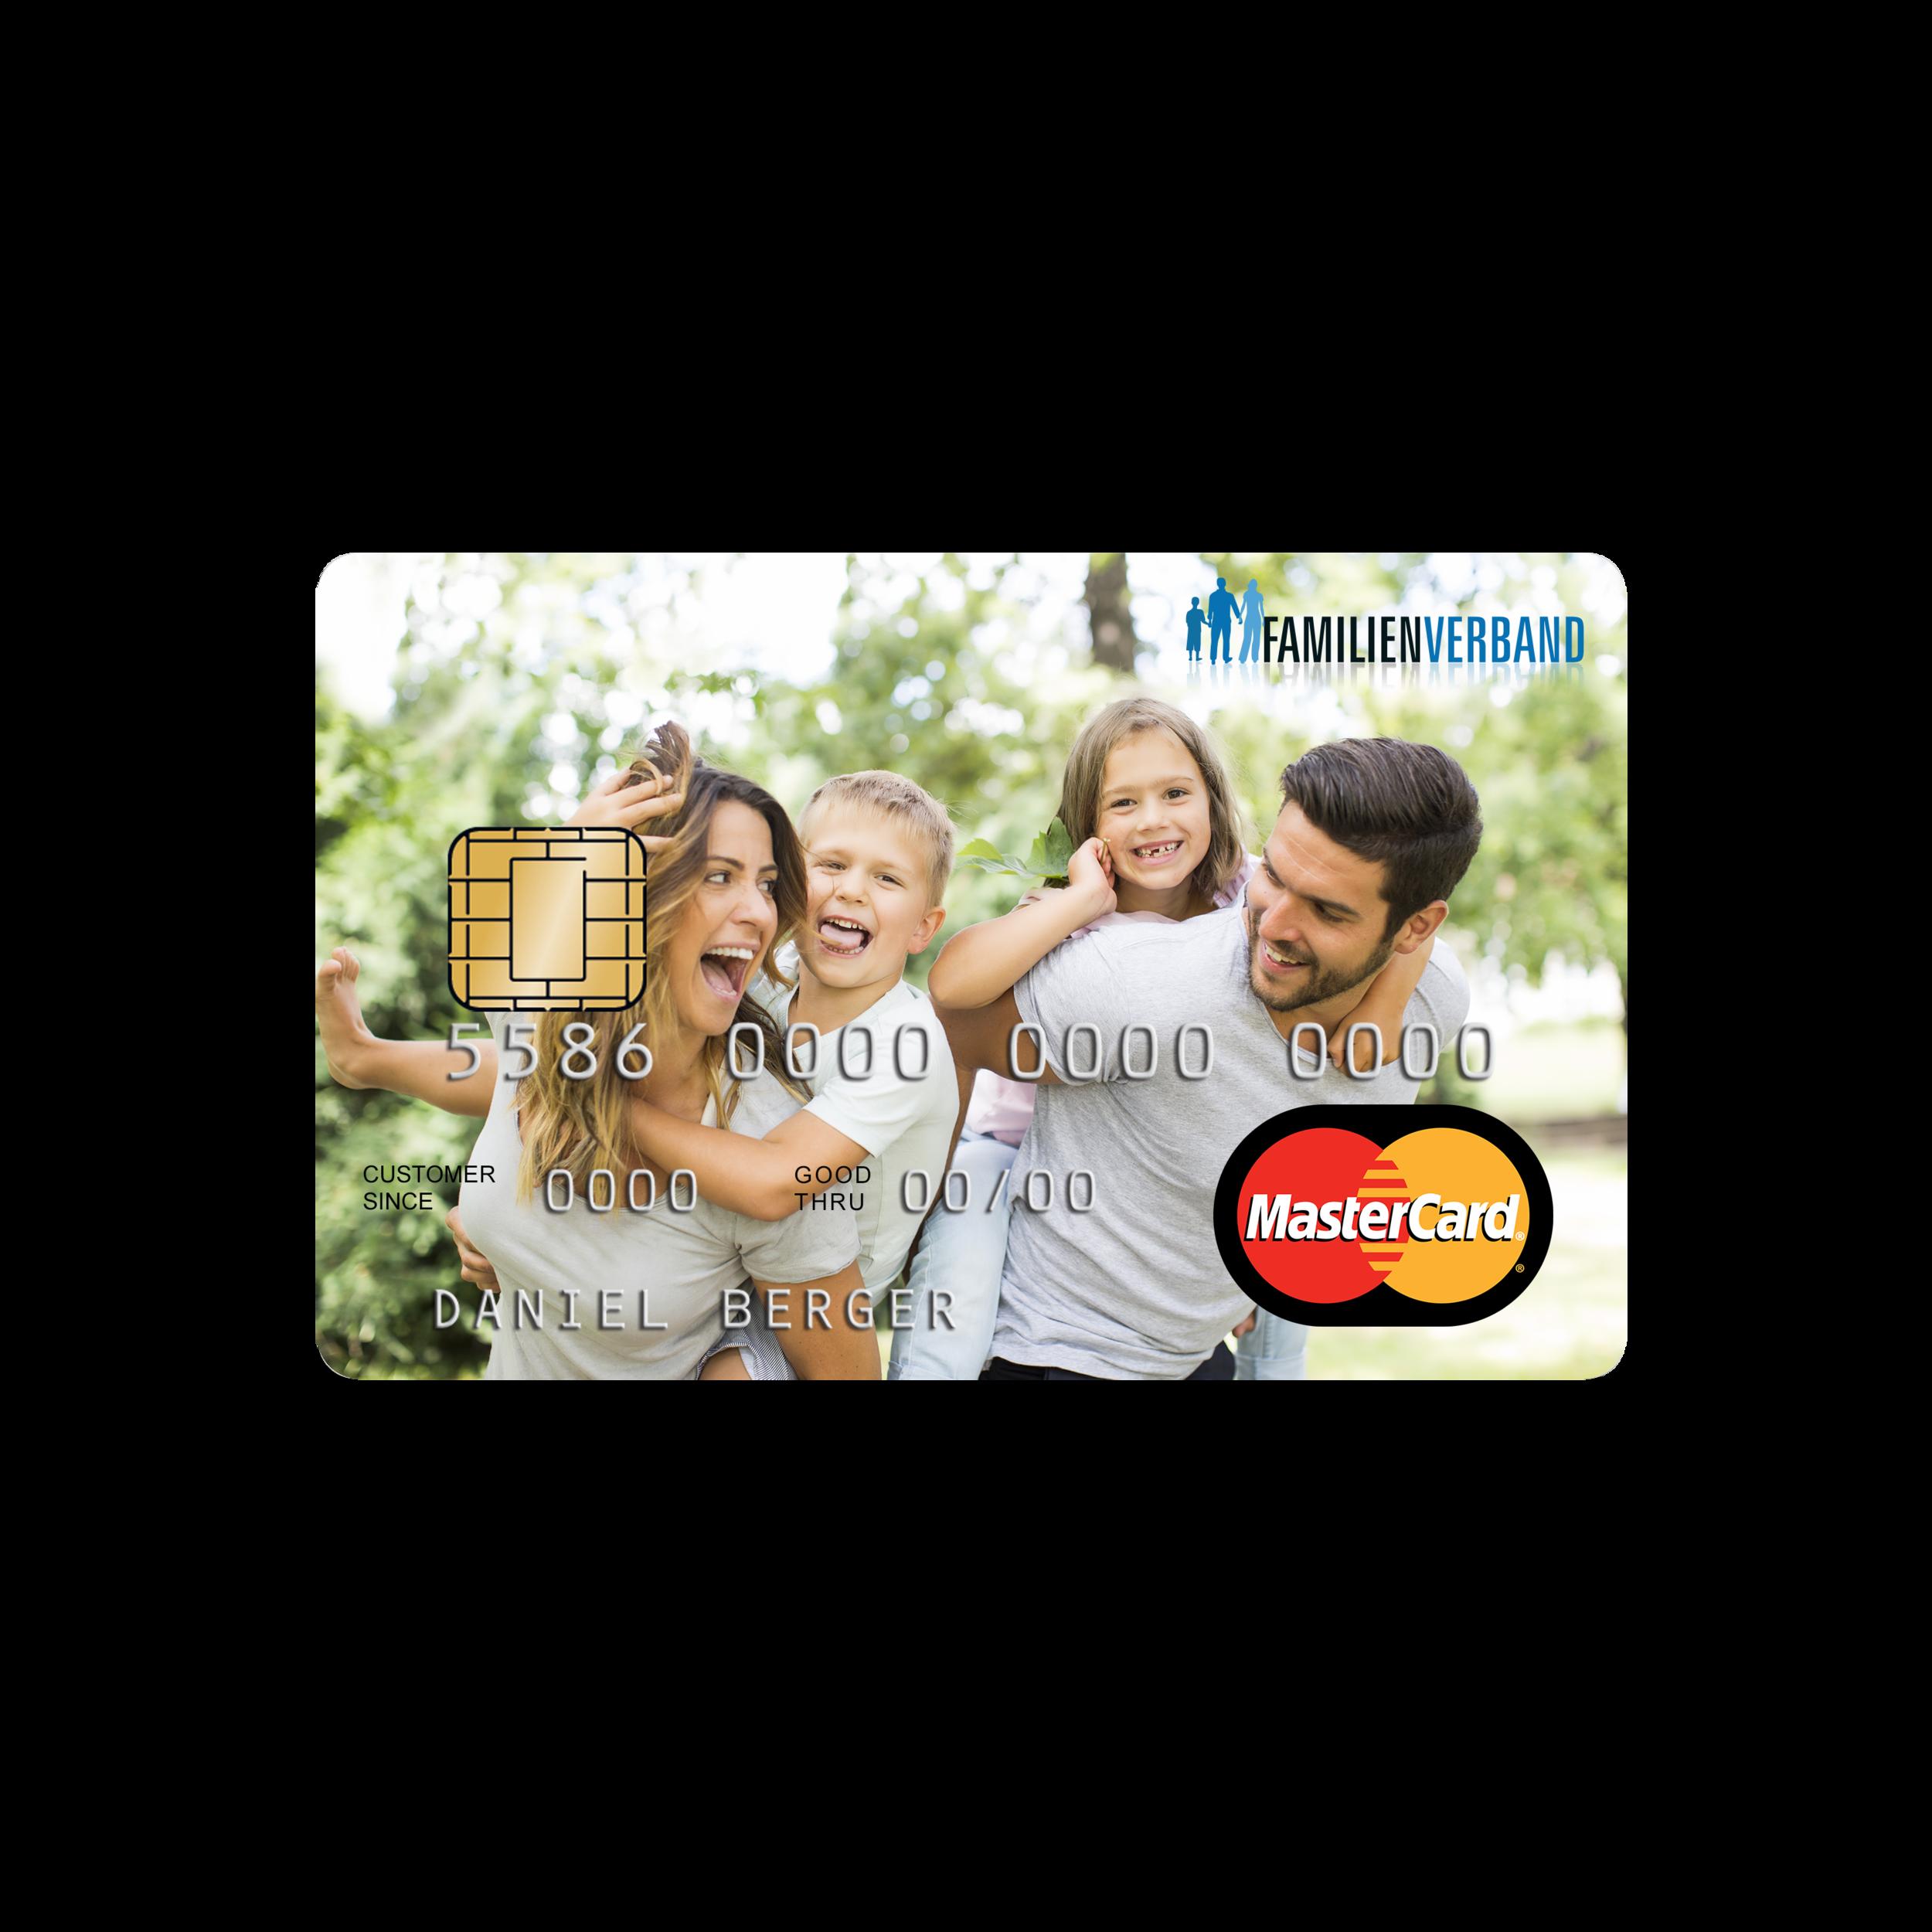 Familienverband_Kreditkarte.png